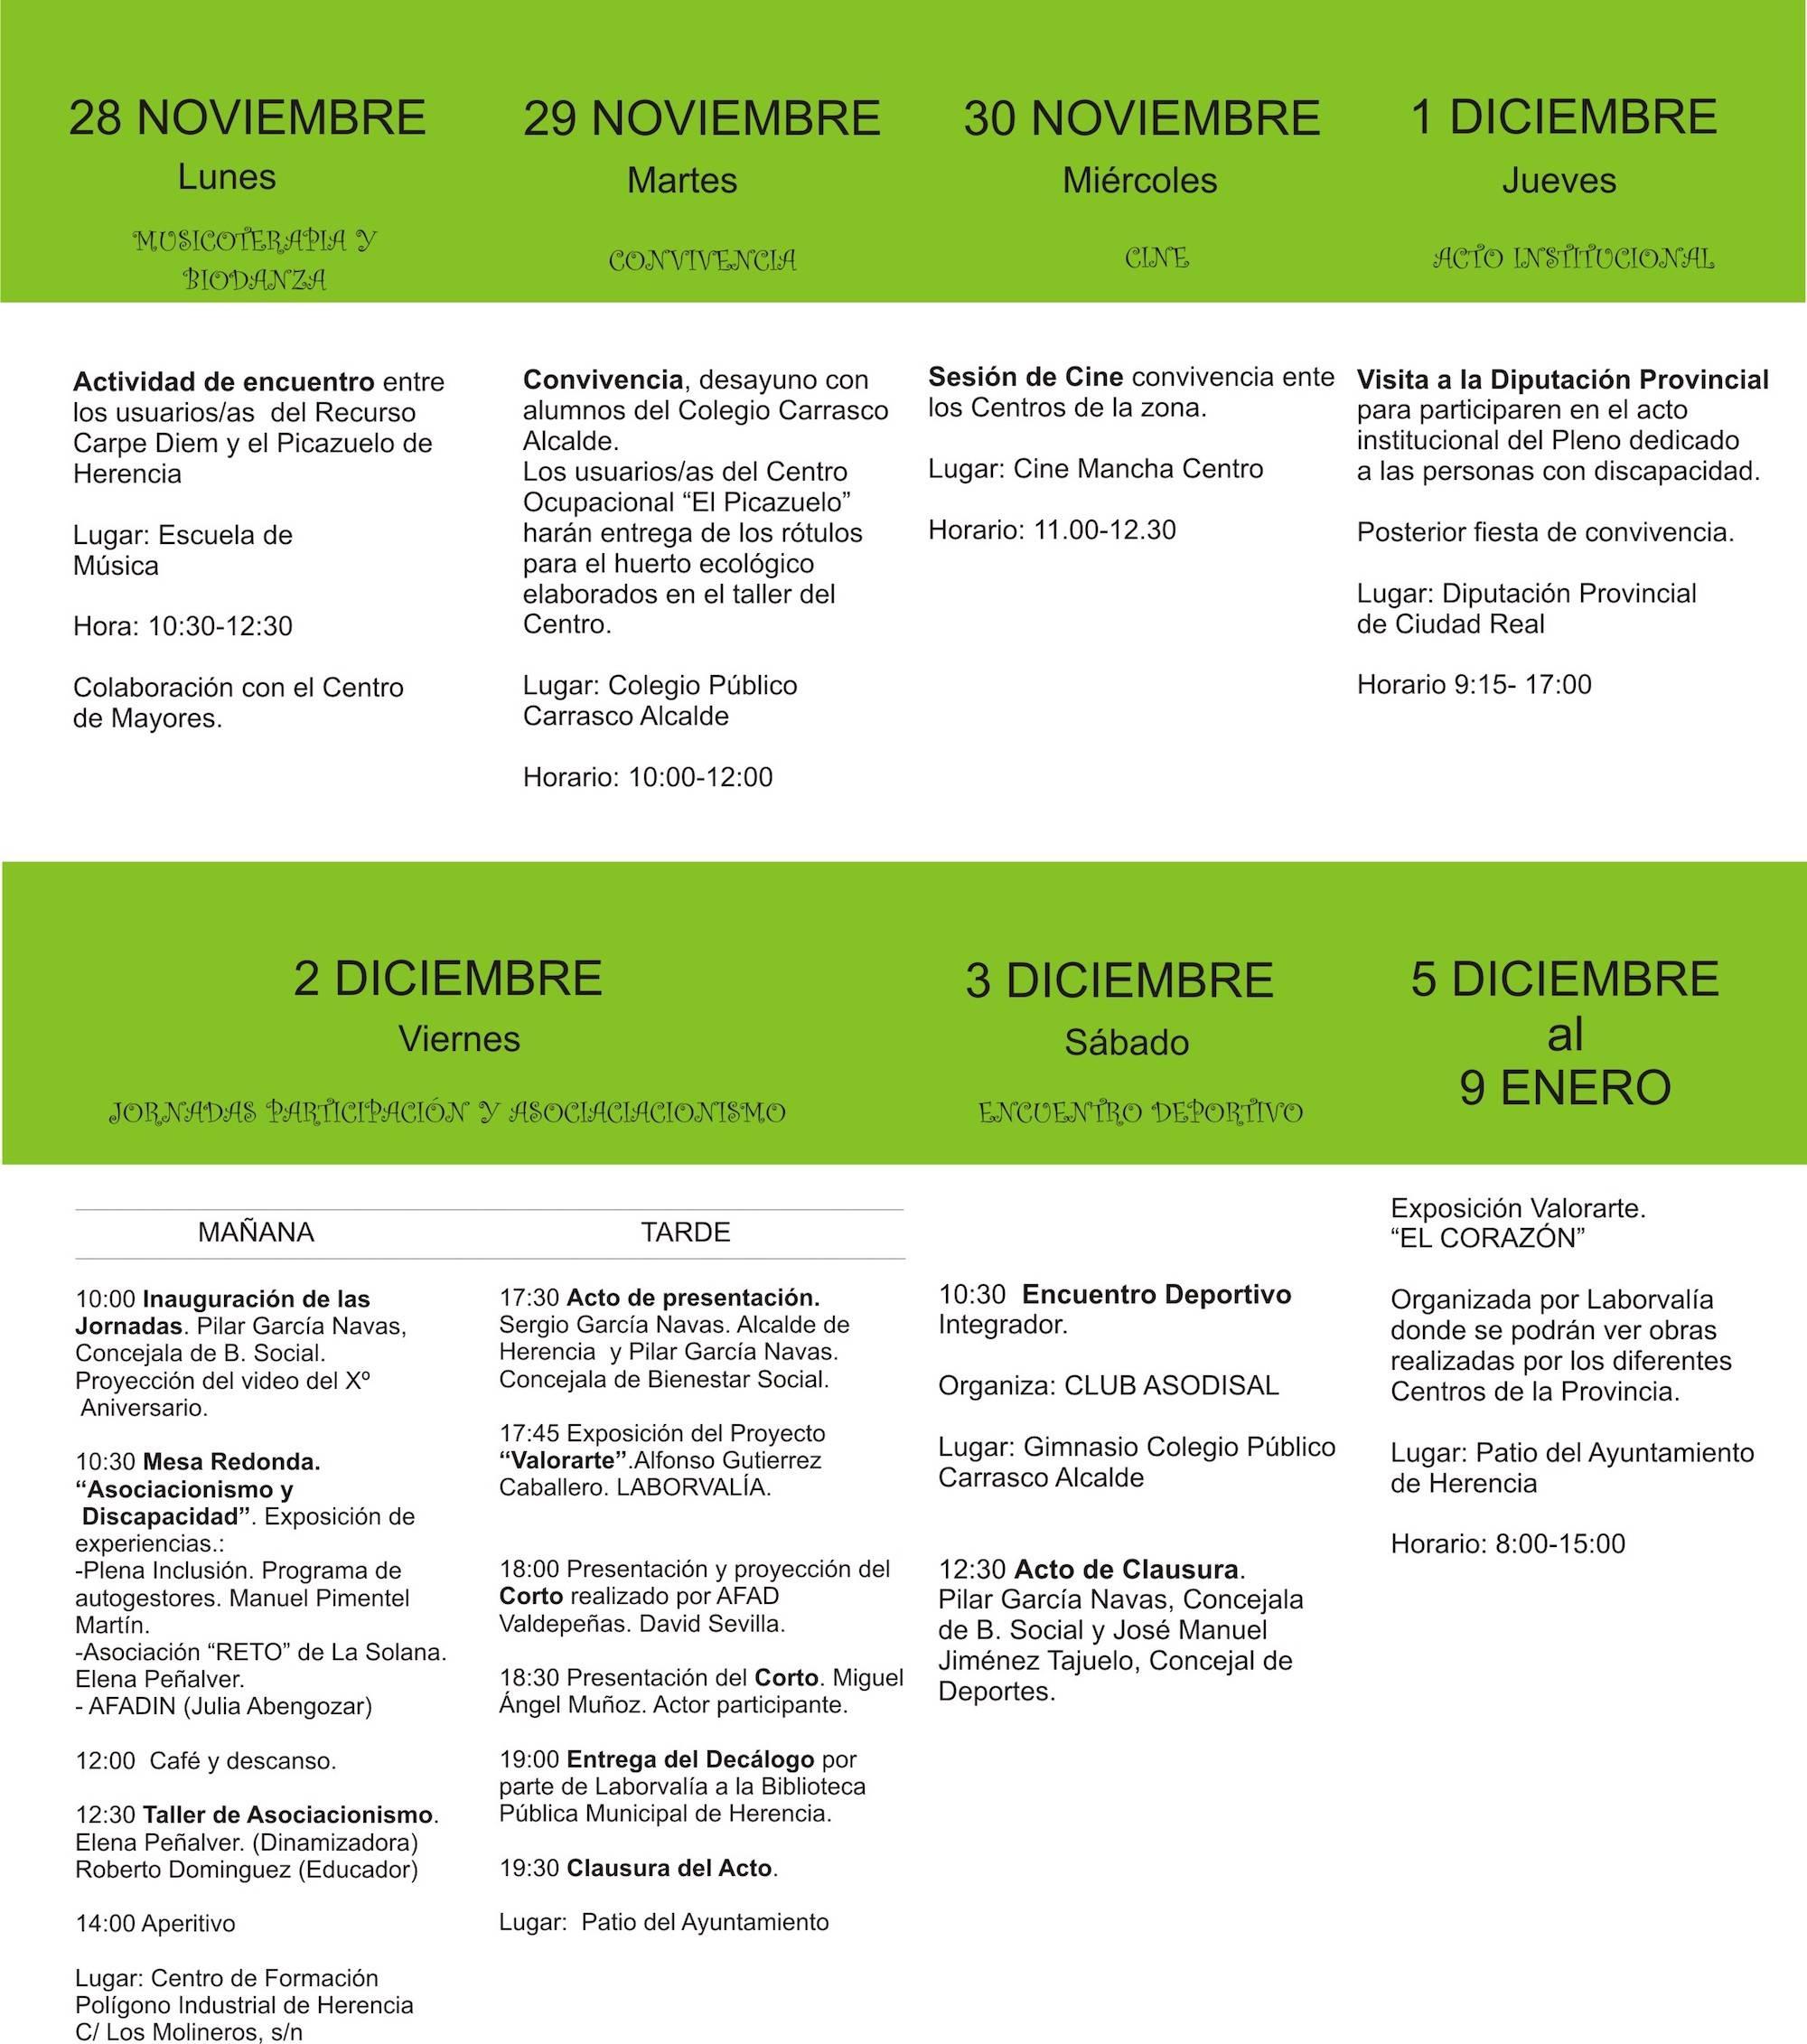 programa de jornadas sobre capacidades diferentes - Jornadas sobre capacidades diferentes 2016 en Herencia